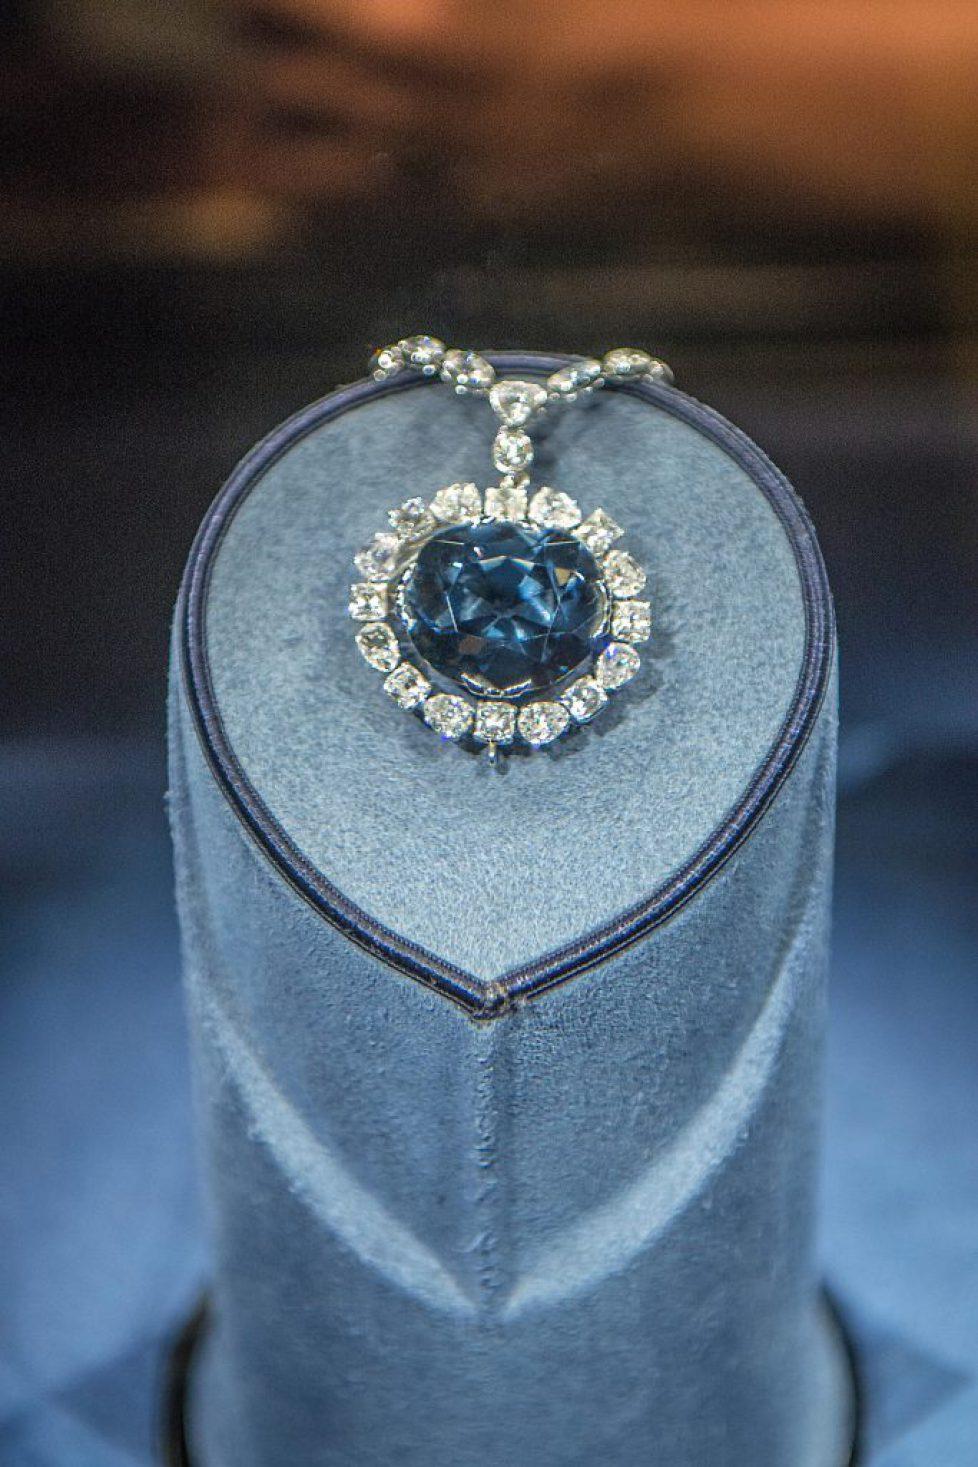 Hope Diamond, Natural History Museum, Washington, DC, USA (Editorial Usage Only)